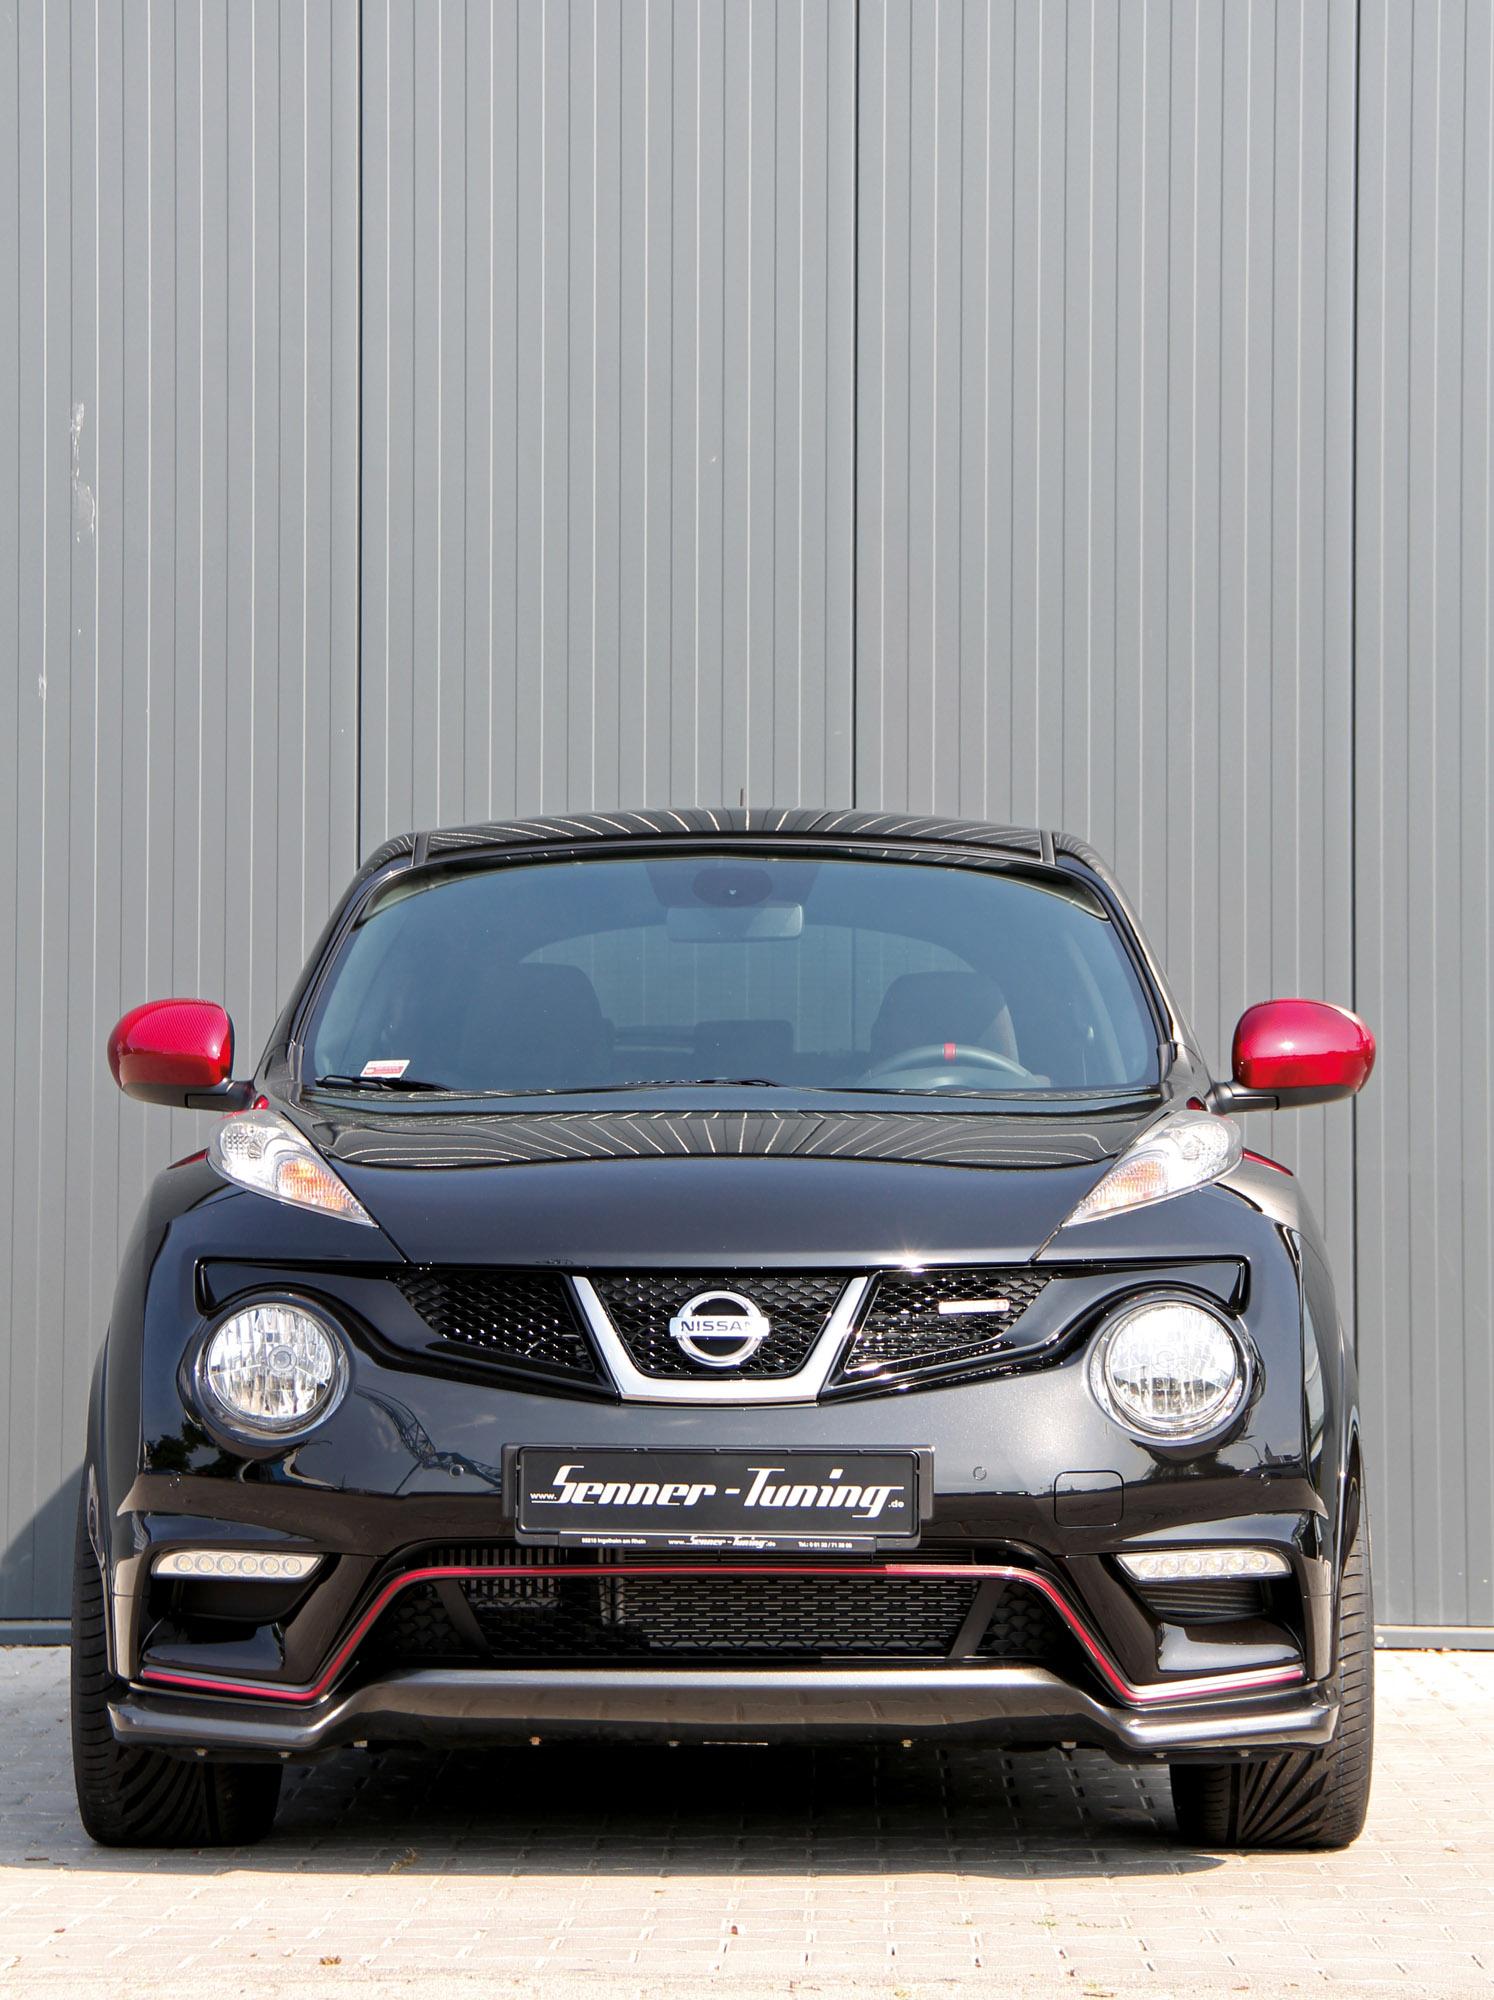 Senner Tuning Nissan Juke Nismo